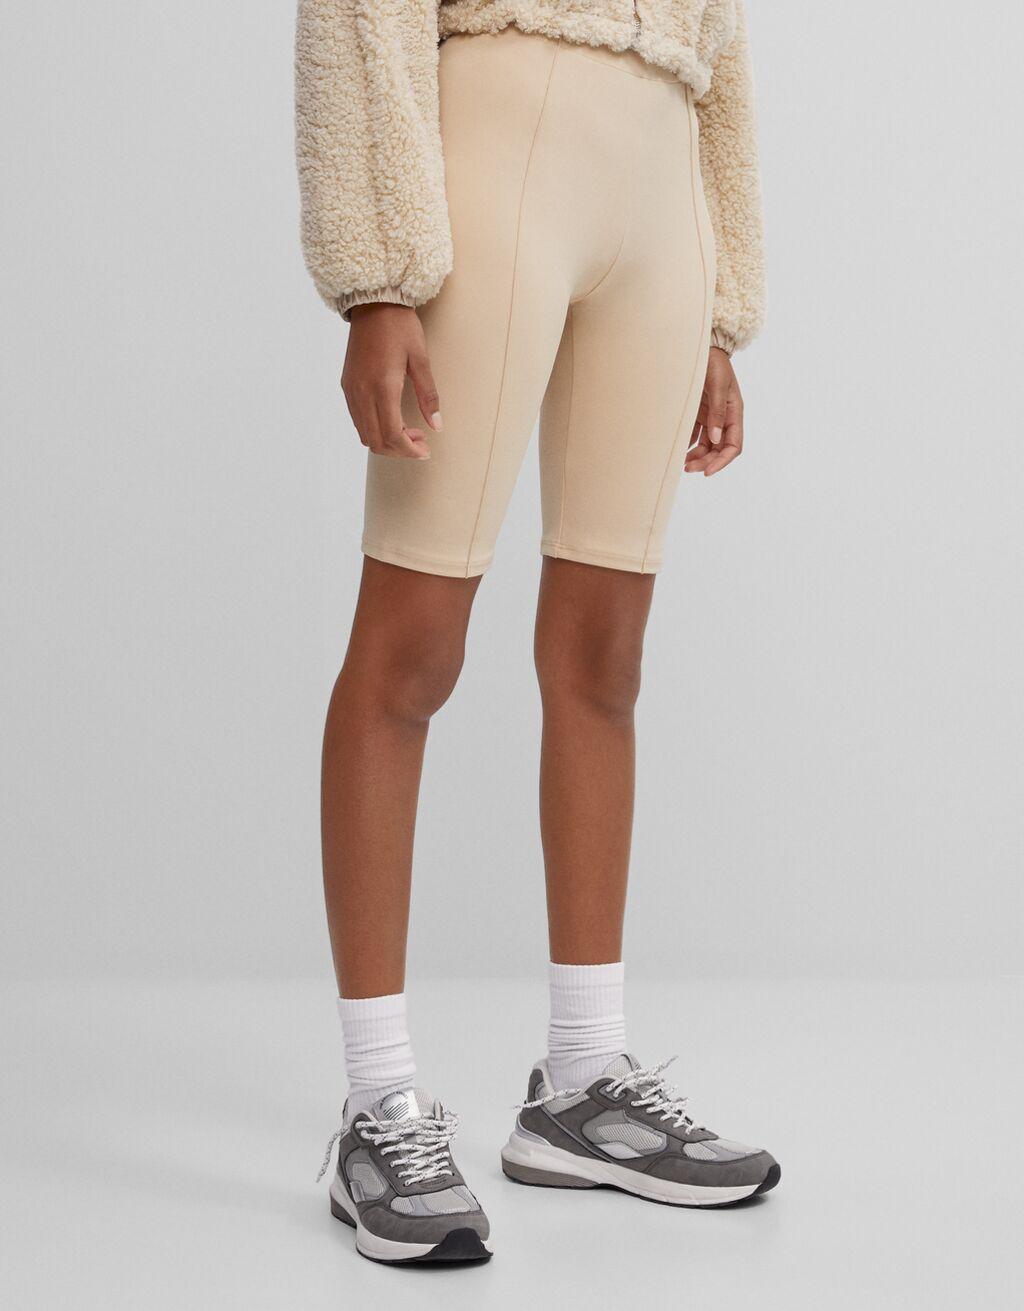 Pantalon cycliste en caoutchouc